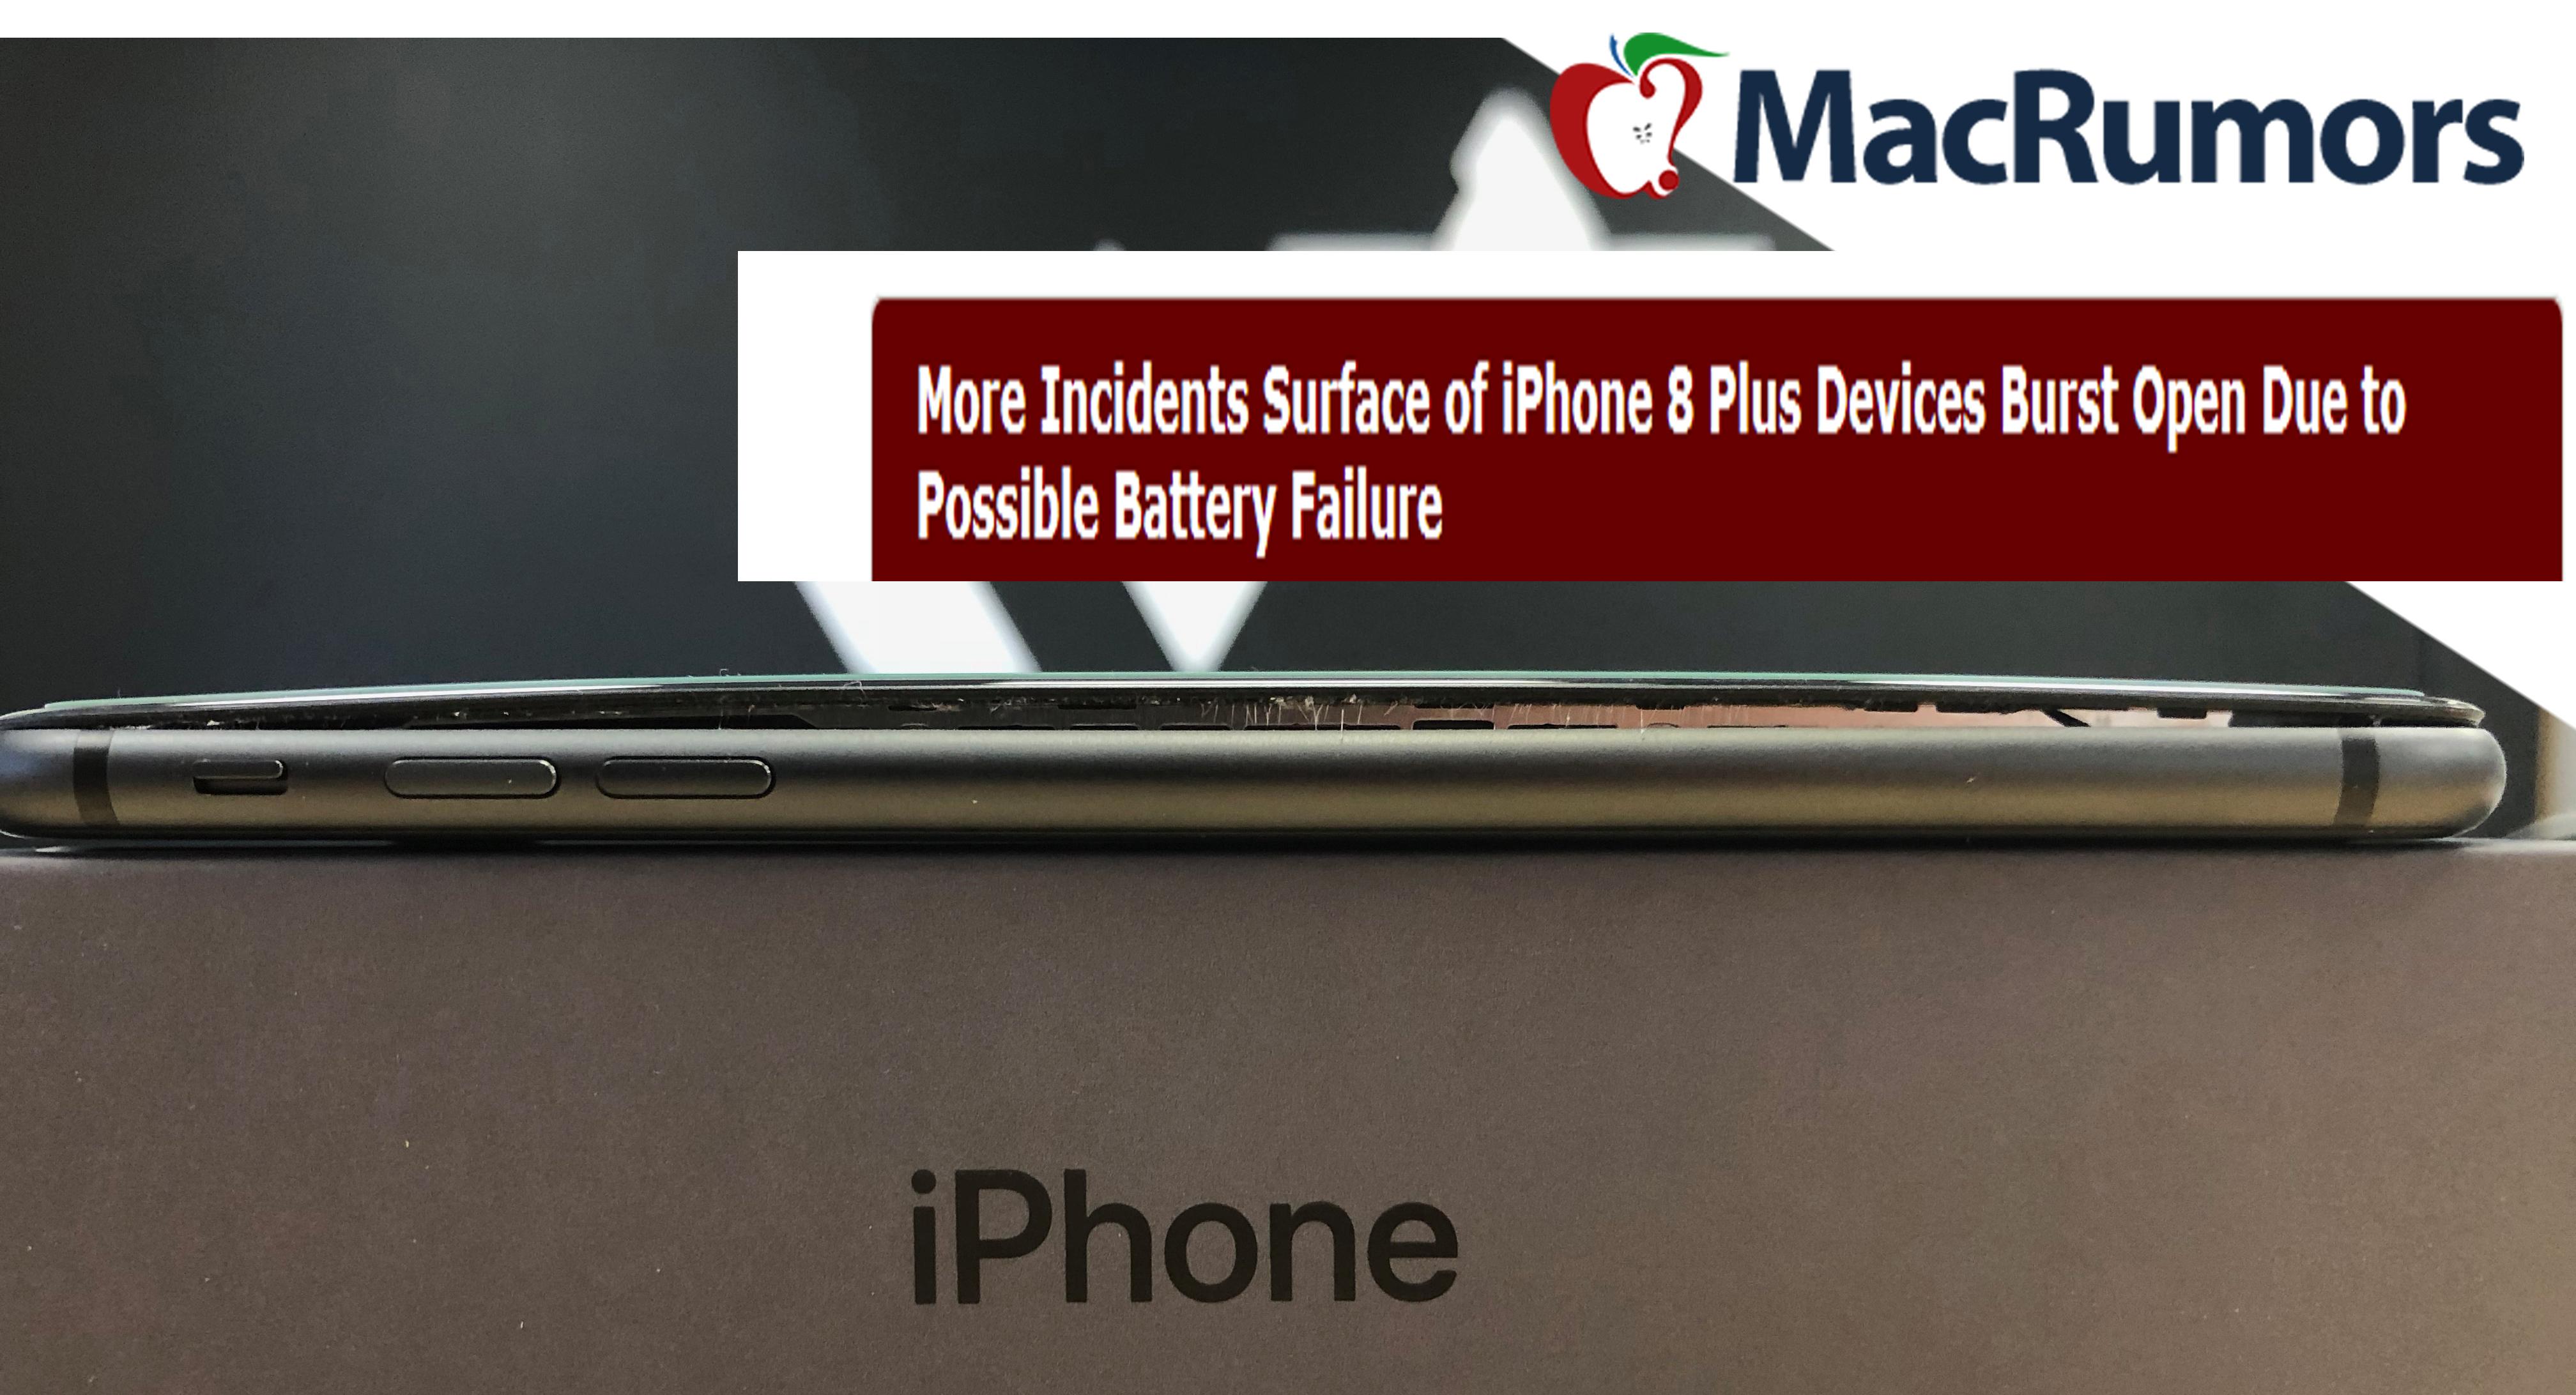 iPhone 8 Plus: To MacRumors προσθέτει και το περιστατικό πελάτη των iRepair στη λίστα με τις διογκωμένες μπαταρίες